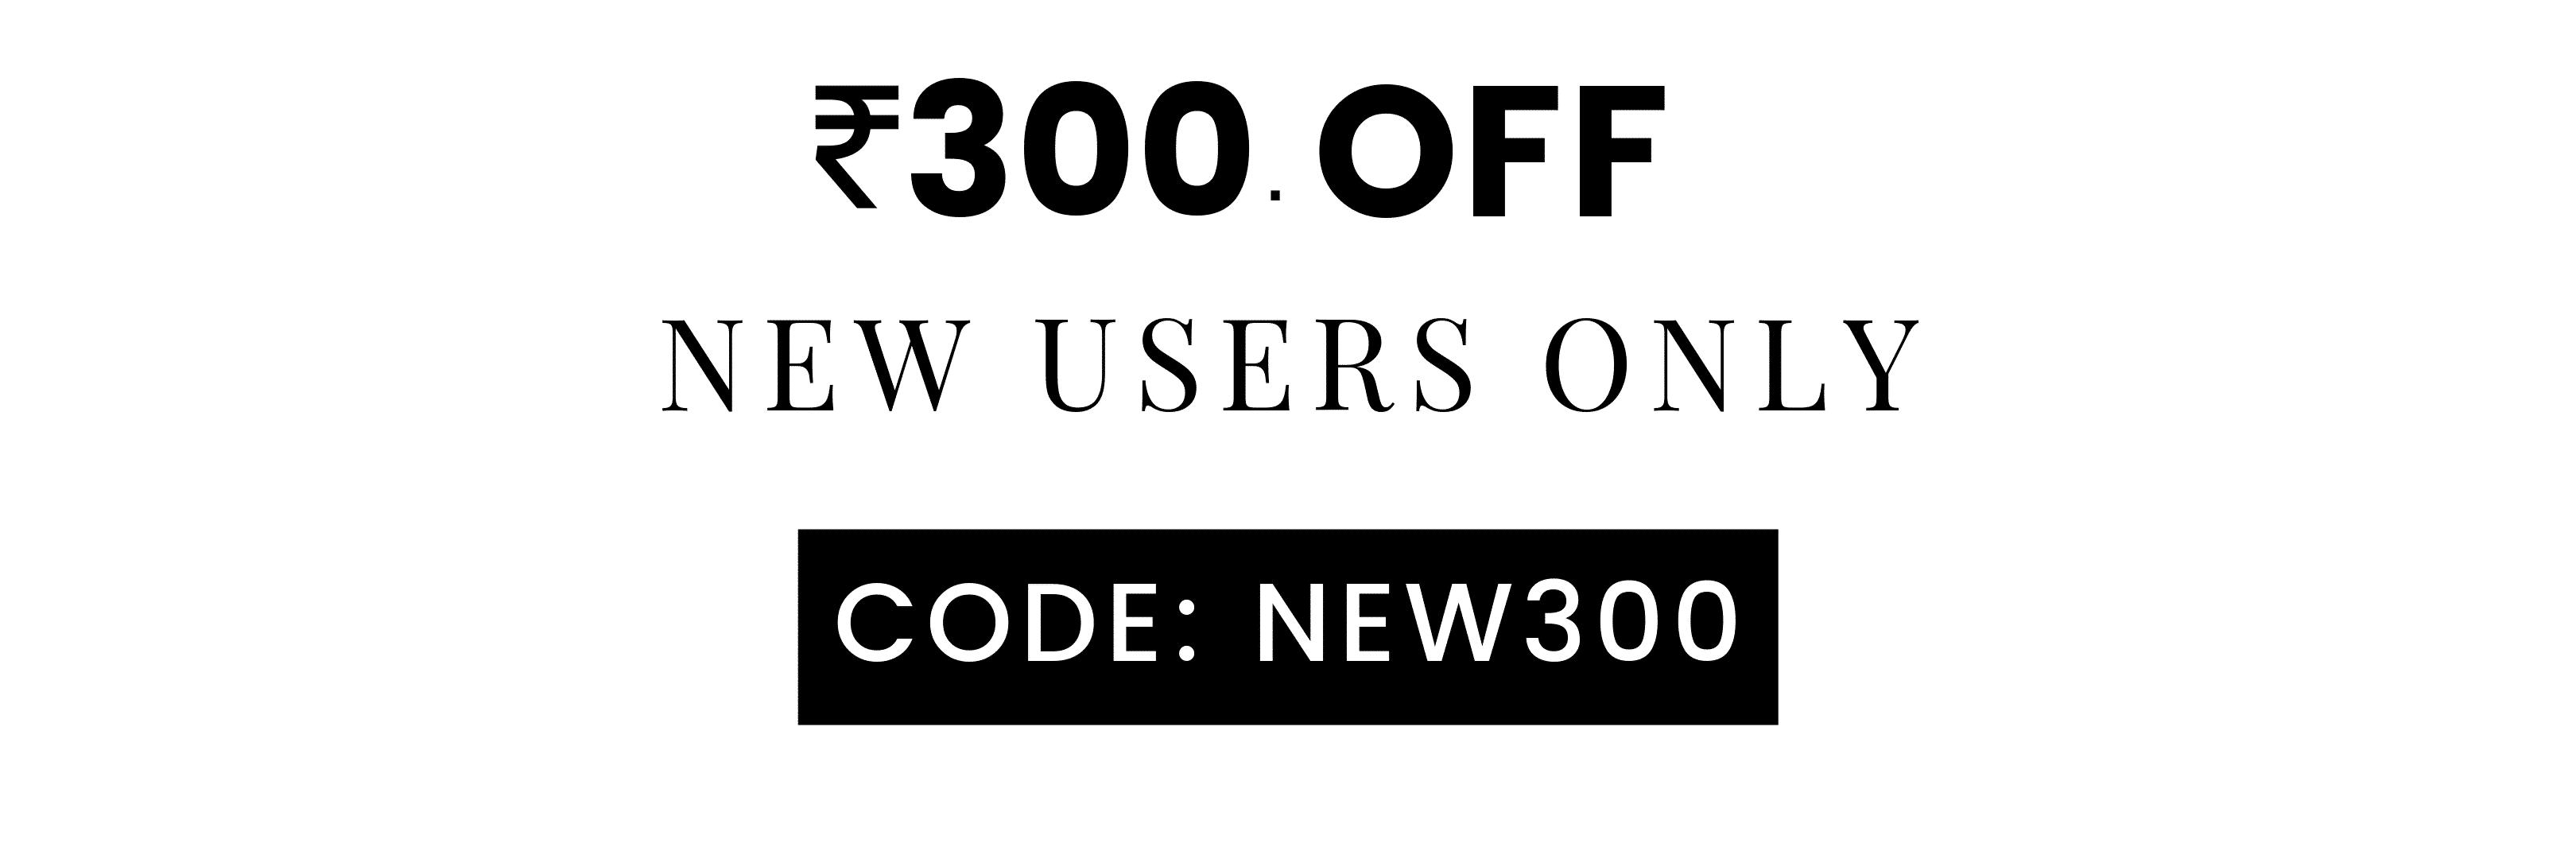 300 off